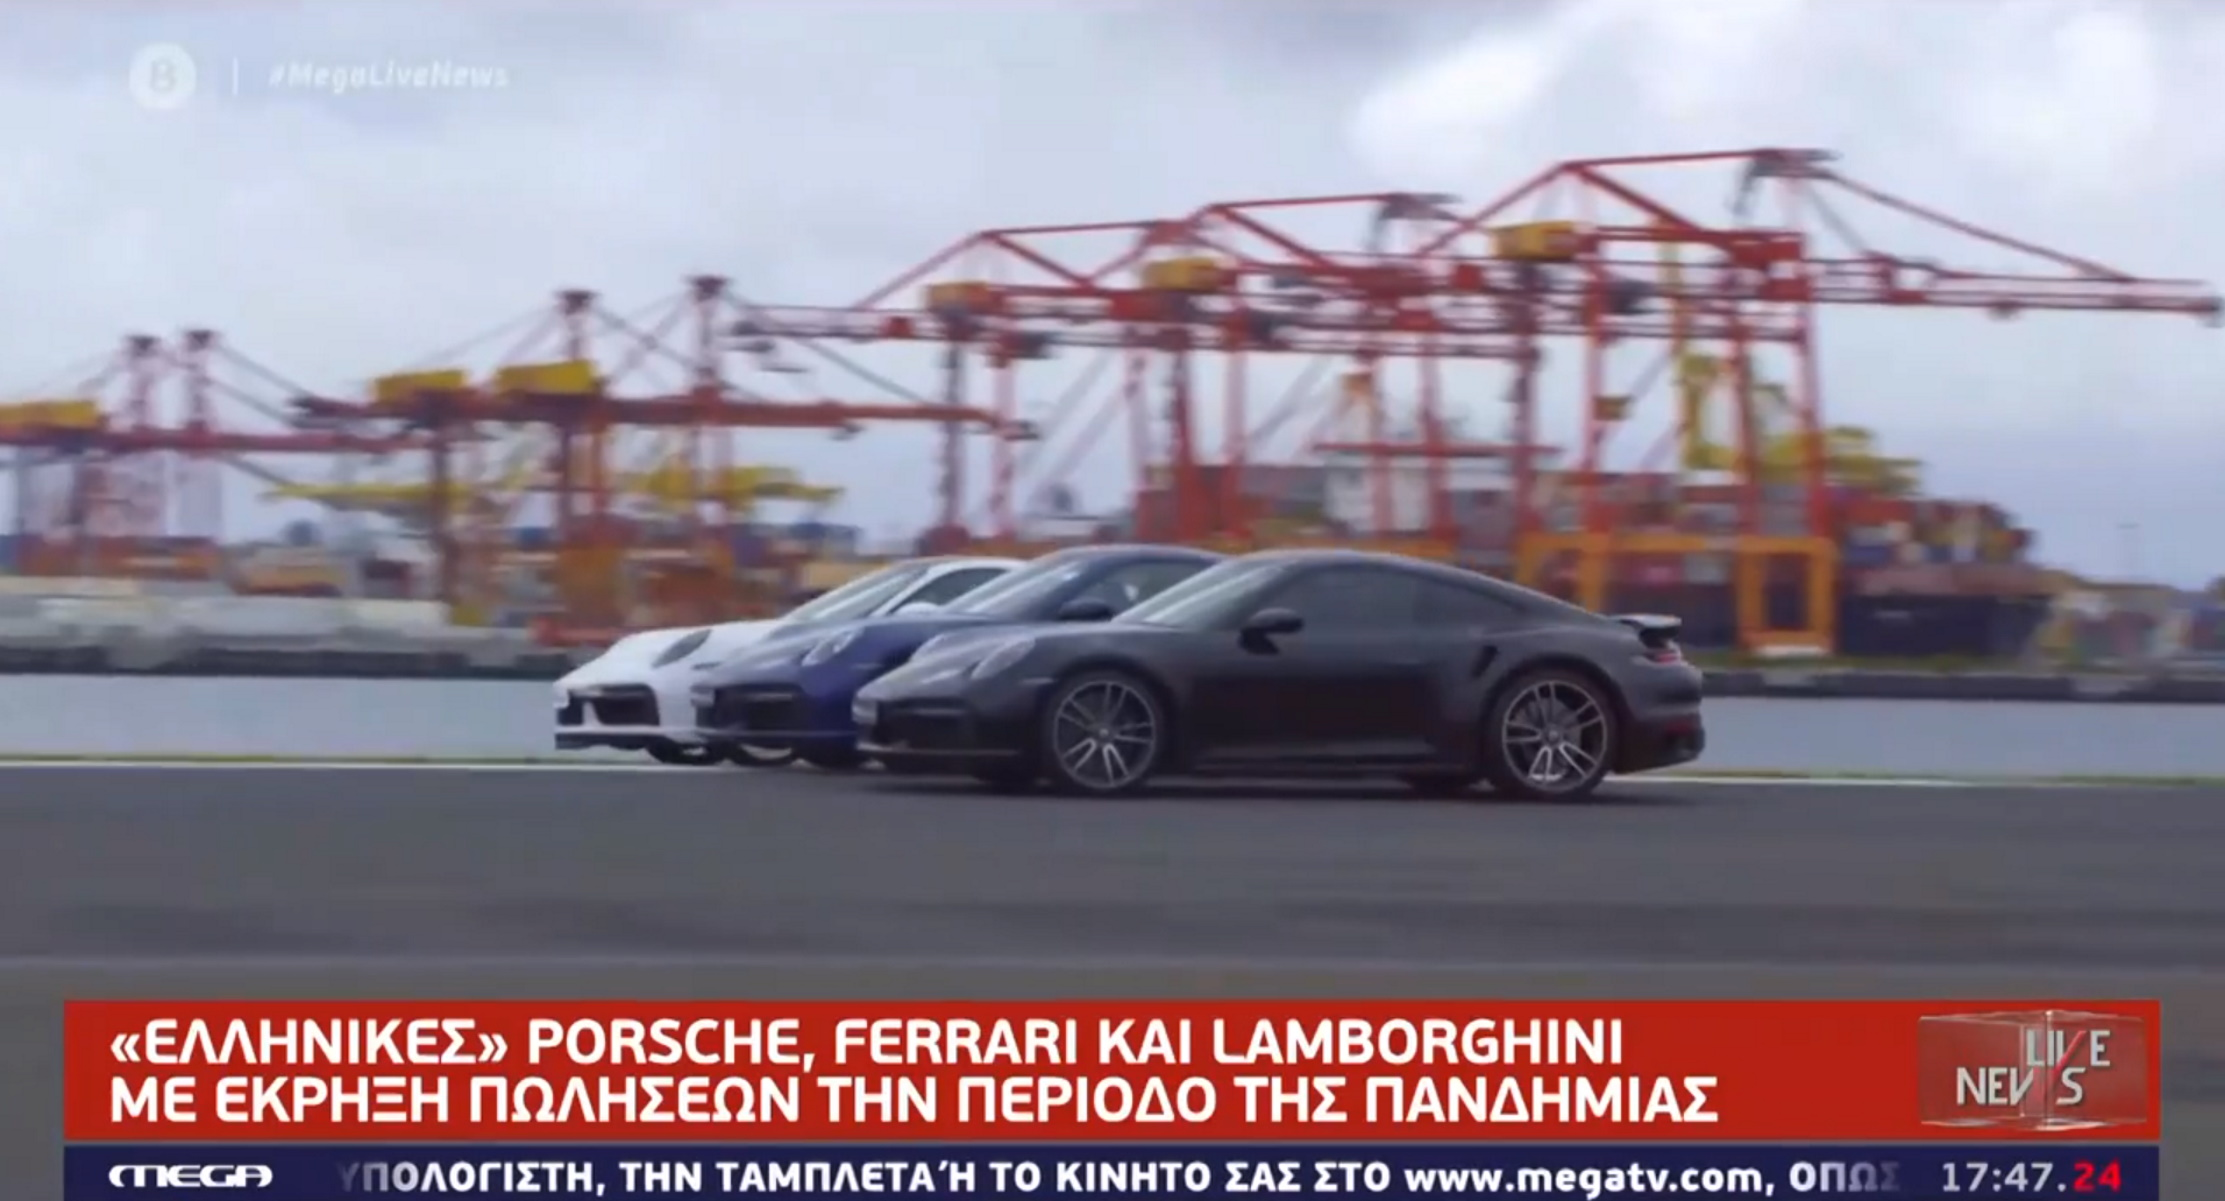 Lockdown: Ούτε μία, ούτε δύο – 210 Porsche αγόρασαν οι Έλληνες στην καραντίνα (video)